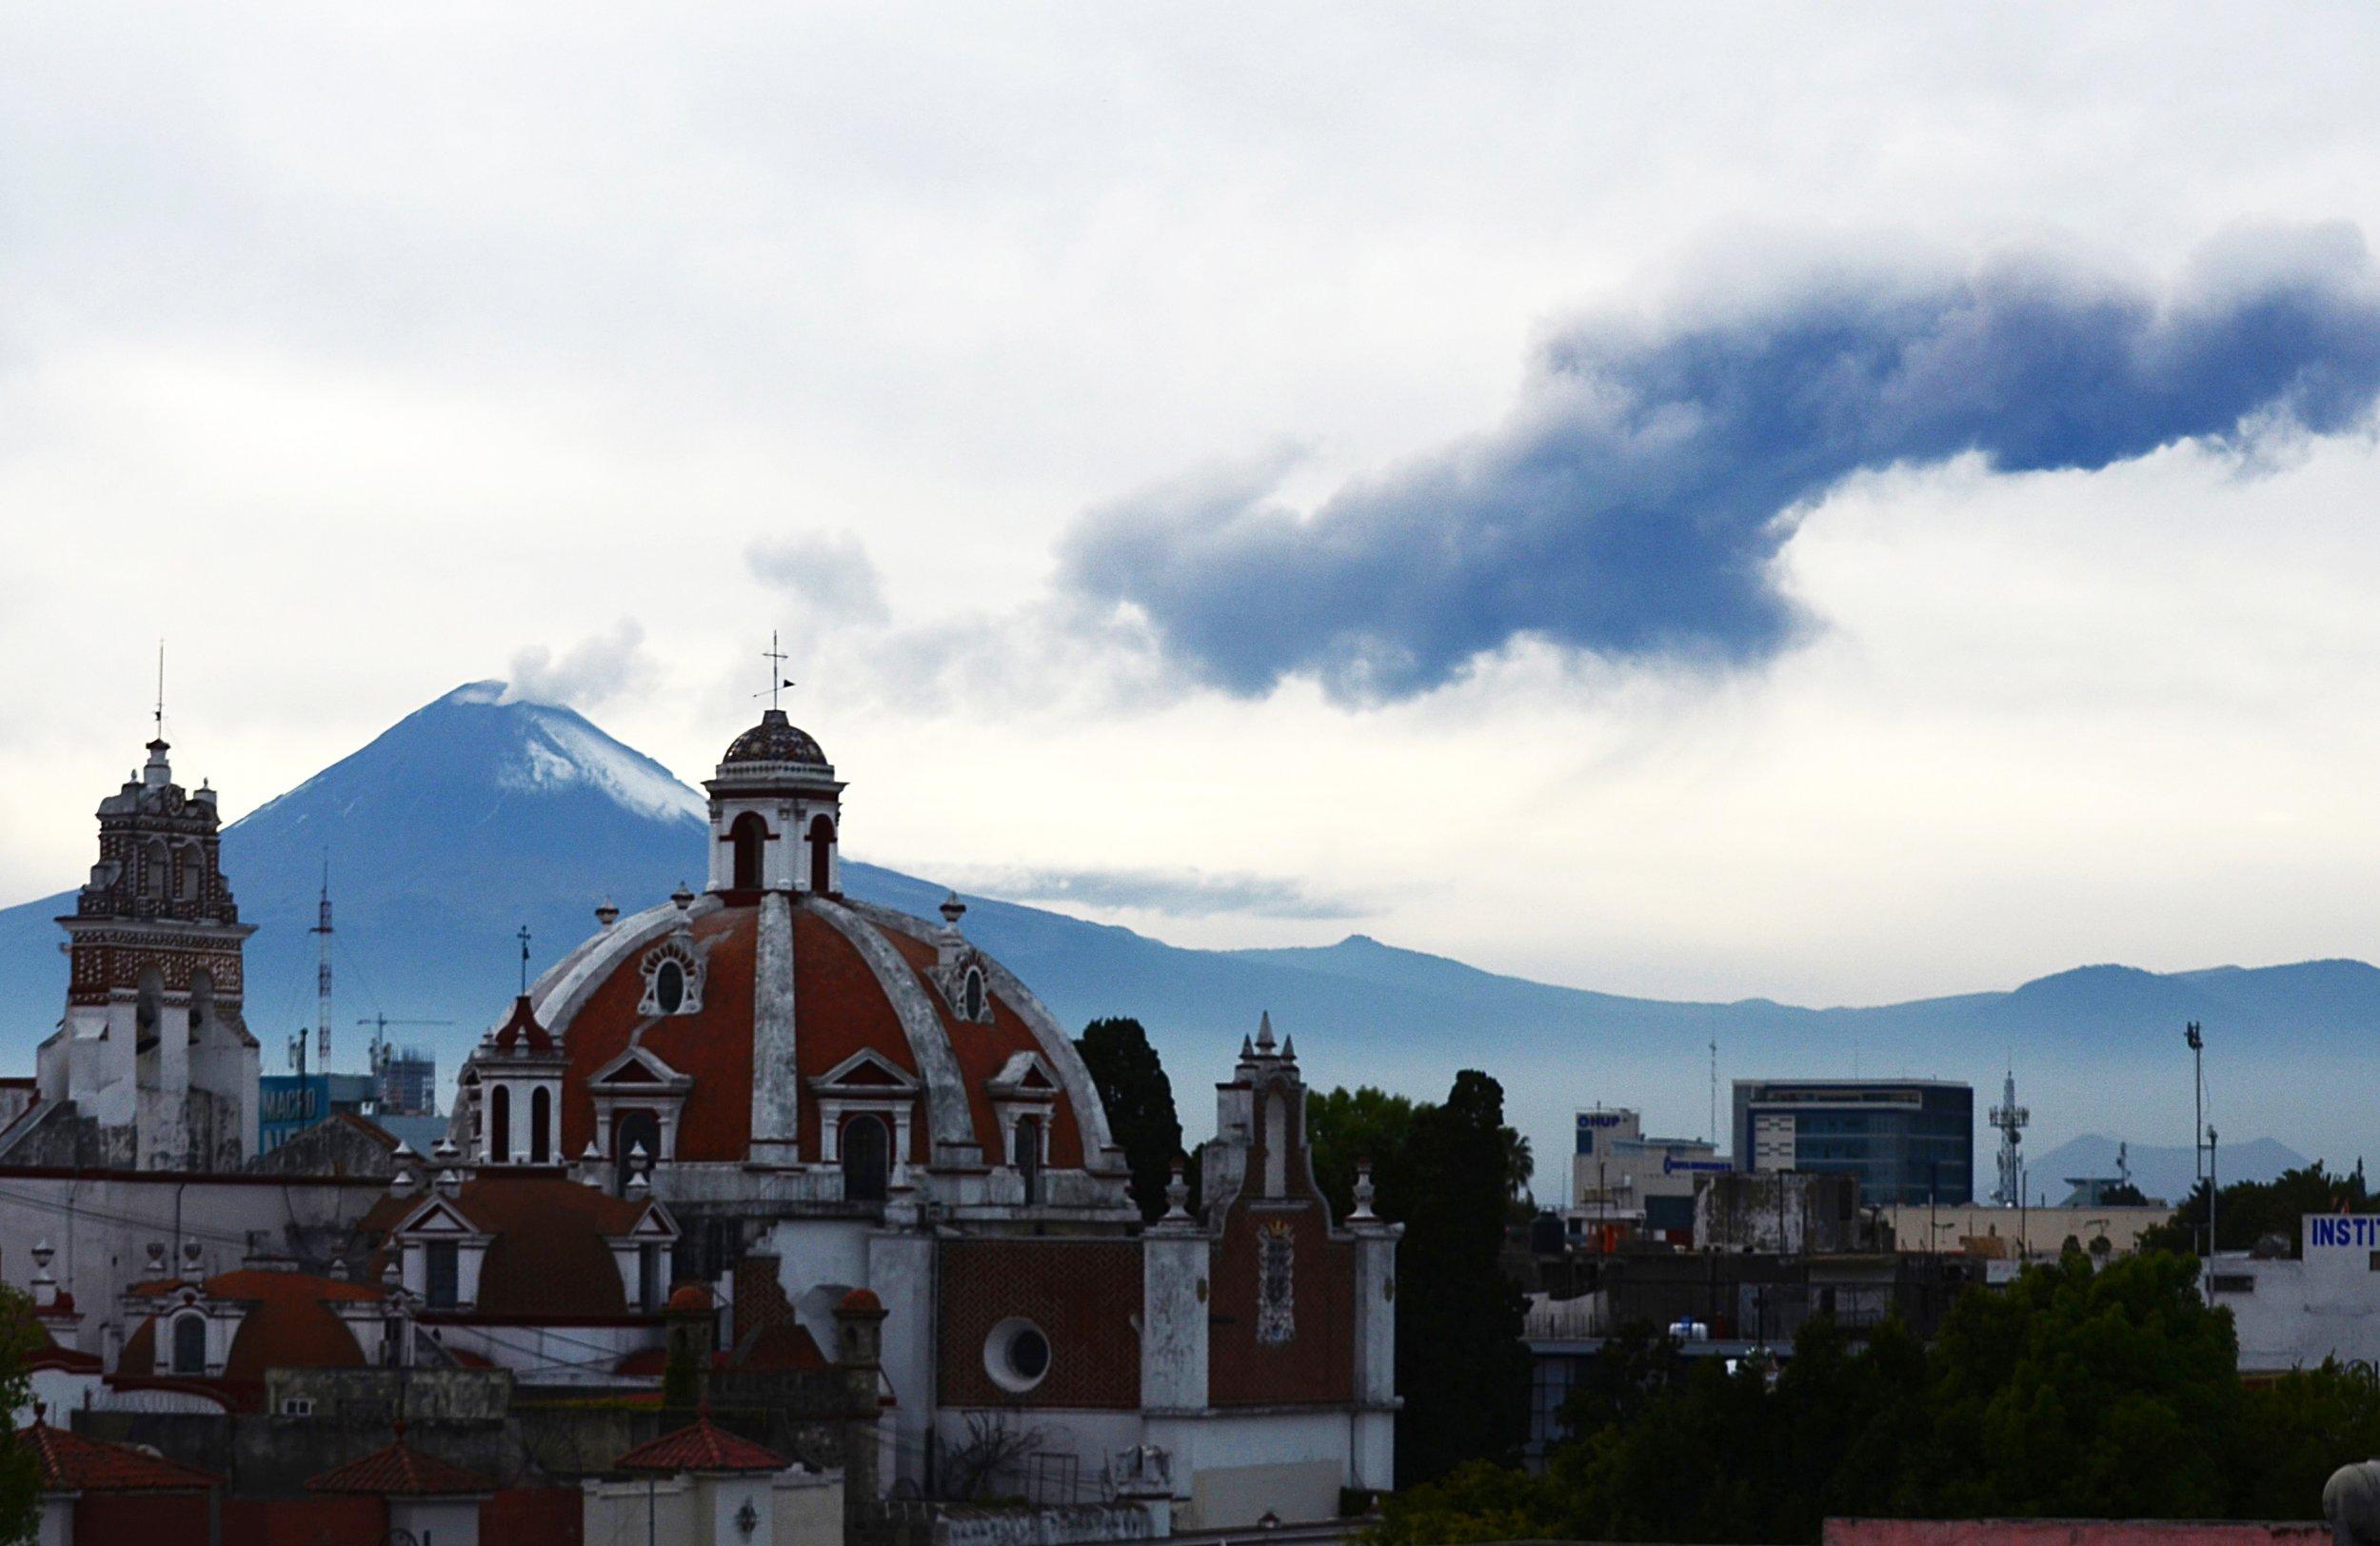 02_01_popocatepetl_january_eruption